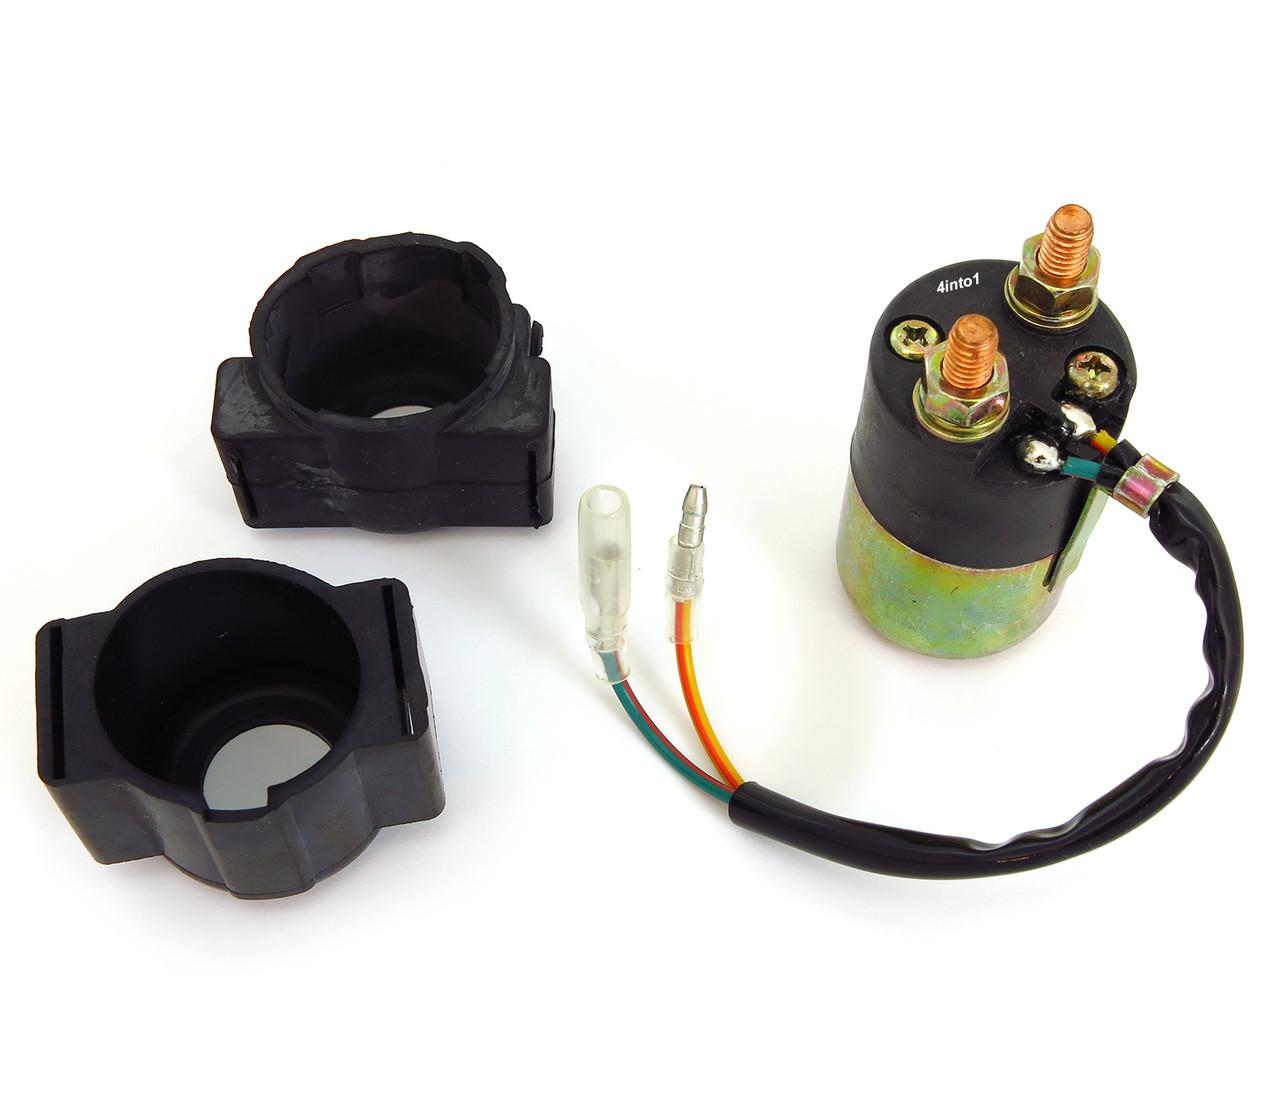 universal starter solenoid honda cb cl175 200 350 360 450 cb400f rh 4into1 com Ford Tractor Solenoid Wiring Diagram 3 Post Solenoid Wiring Diagram